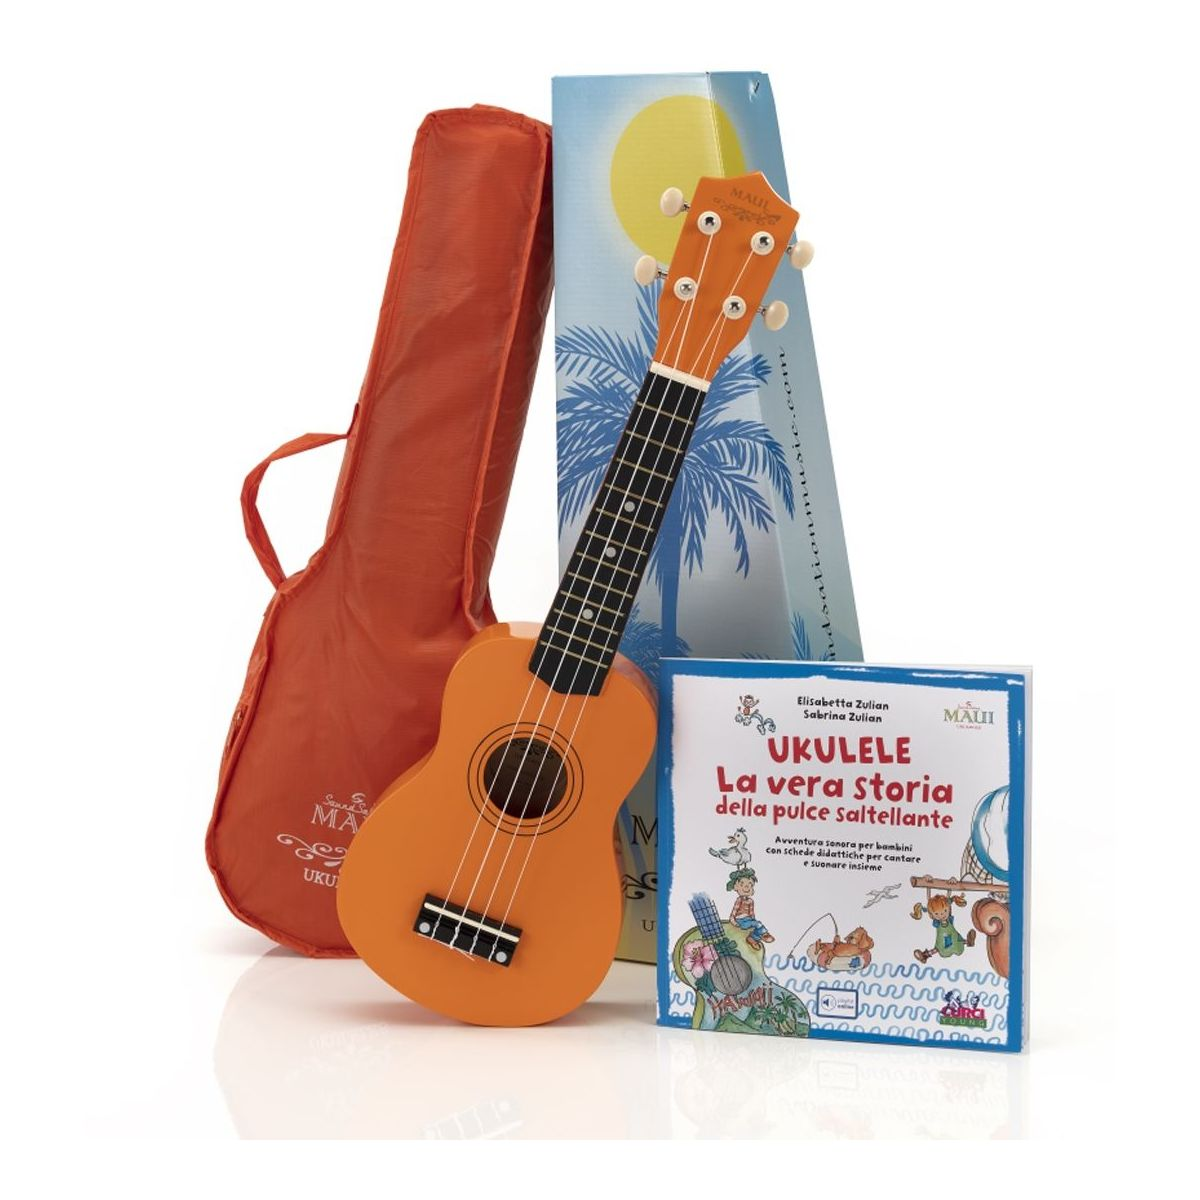 Ukulele soprano Maui SUNNY 10 con borsa arancio